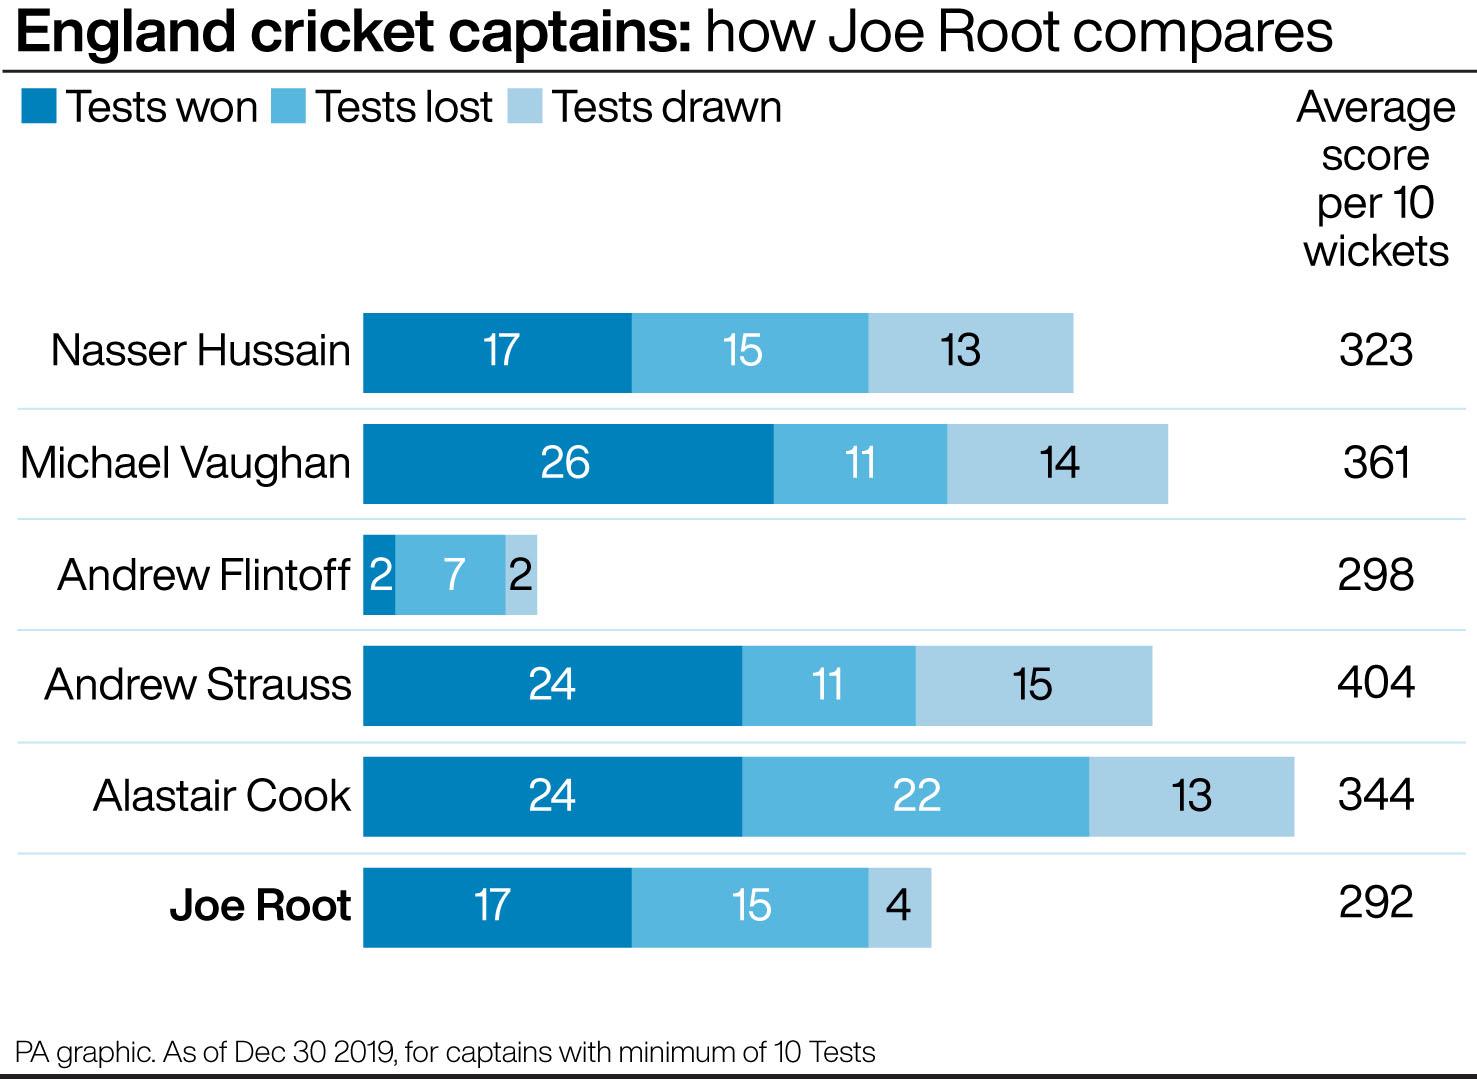 England captains: how Joe Root compares